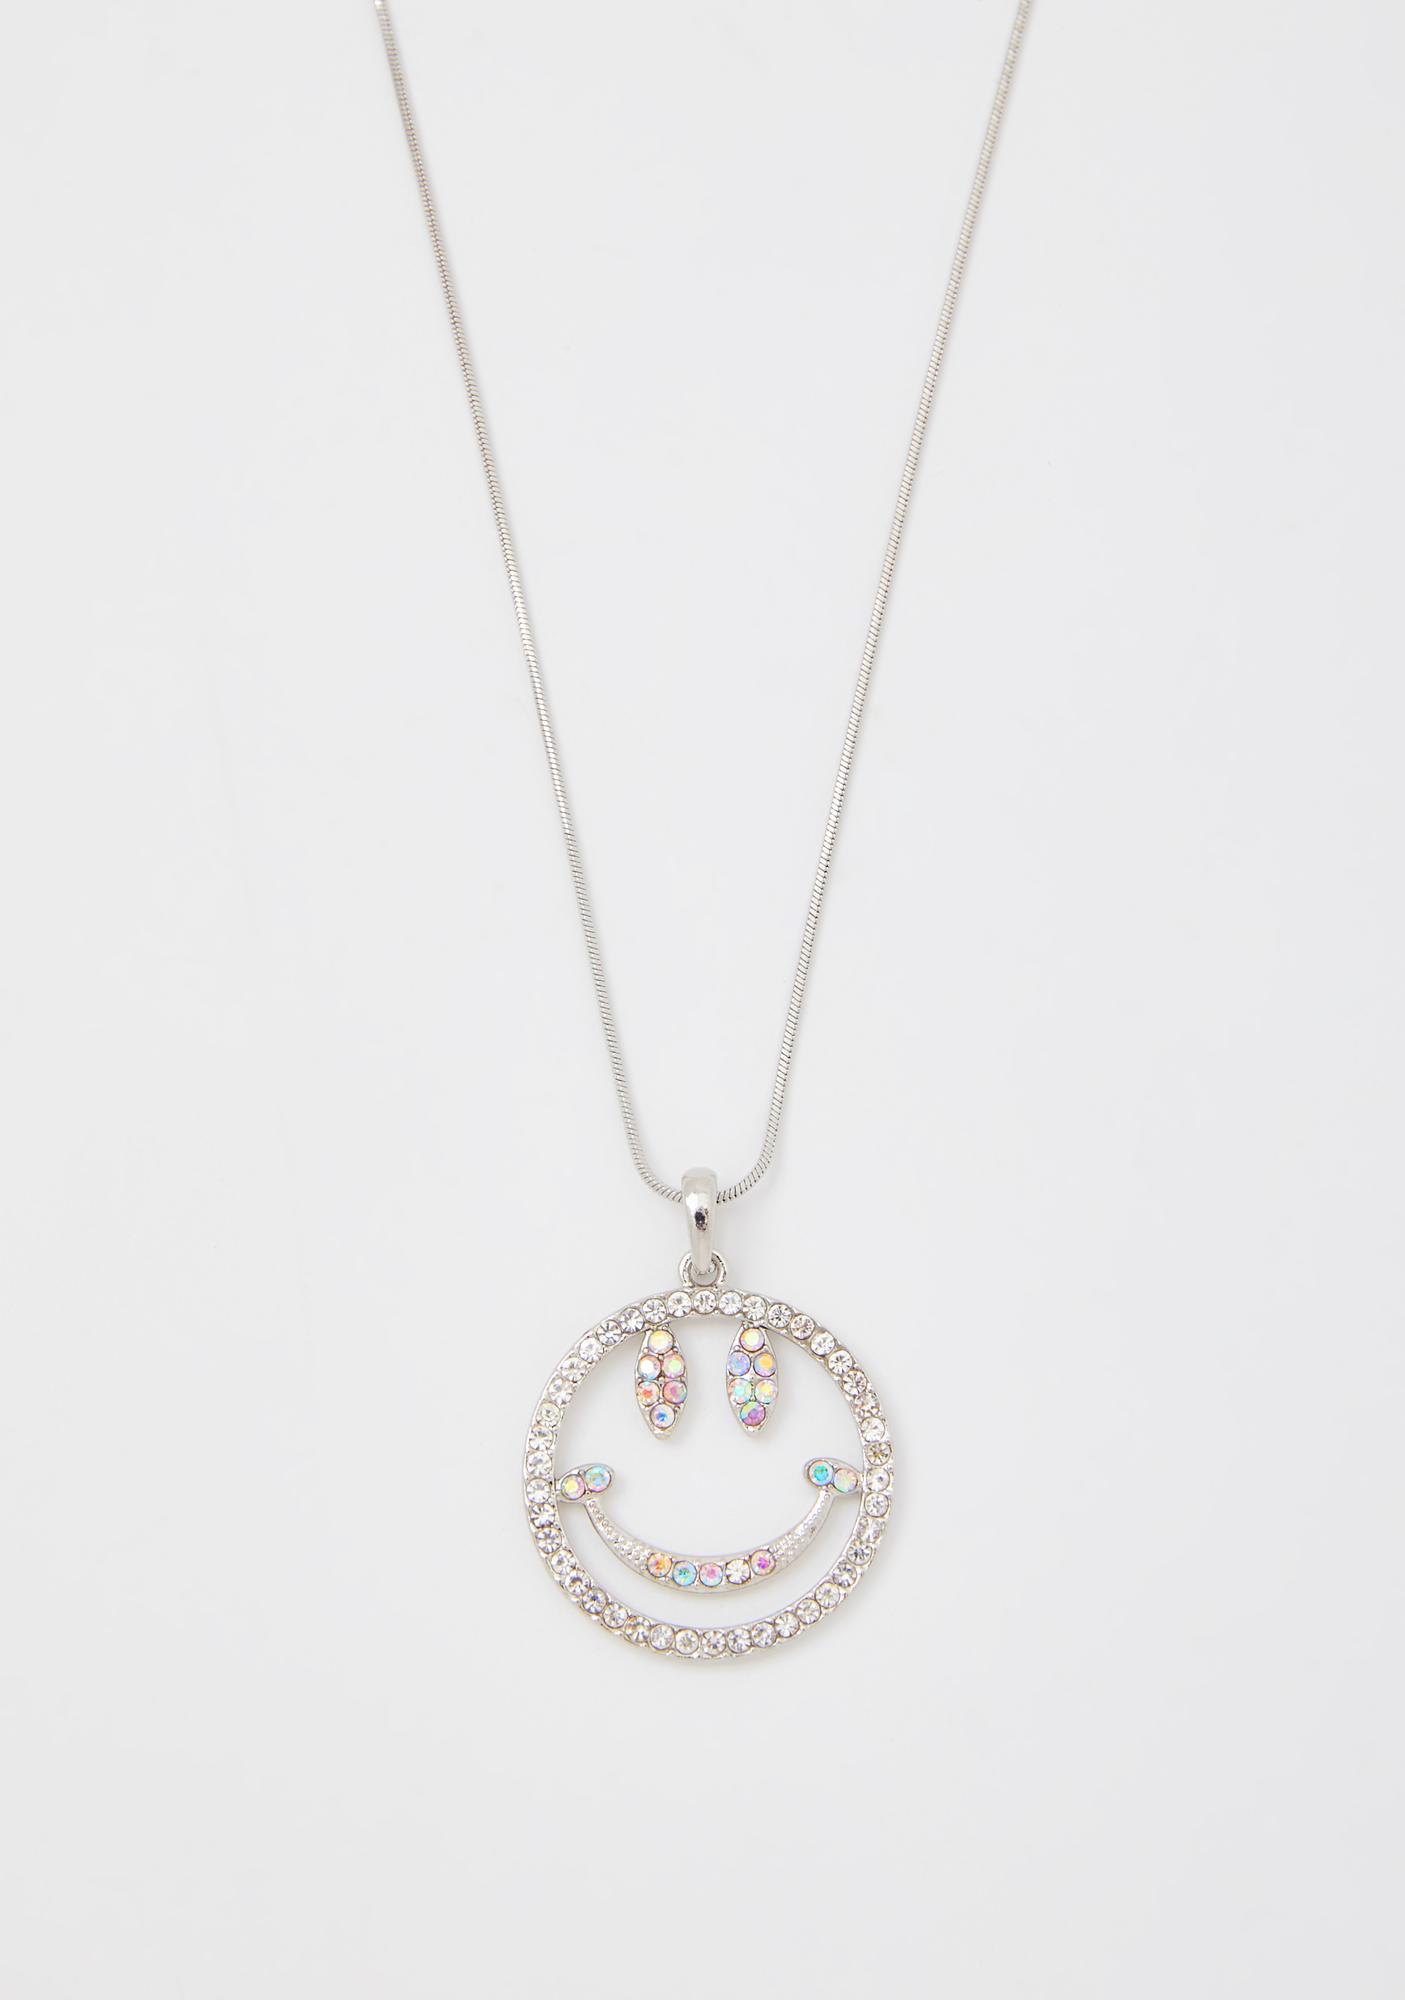 Joyful Luster Pendant Necklace